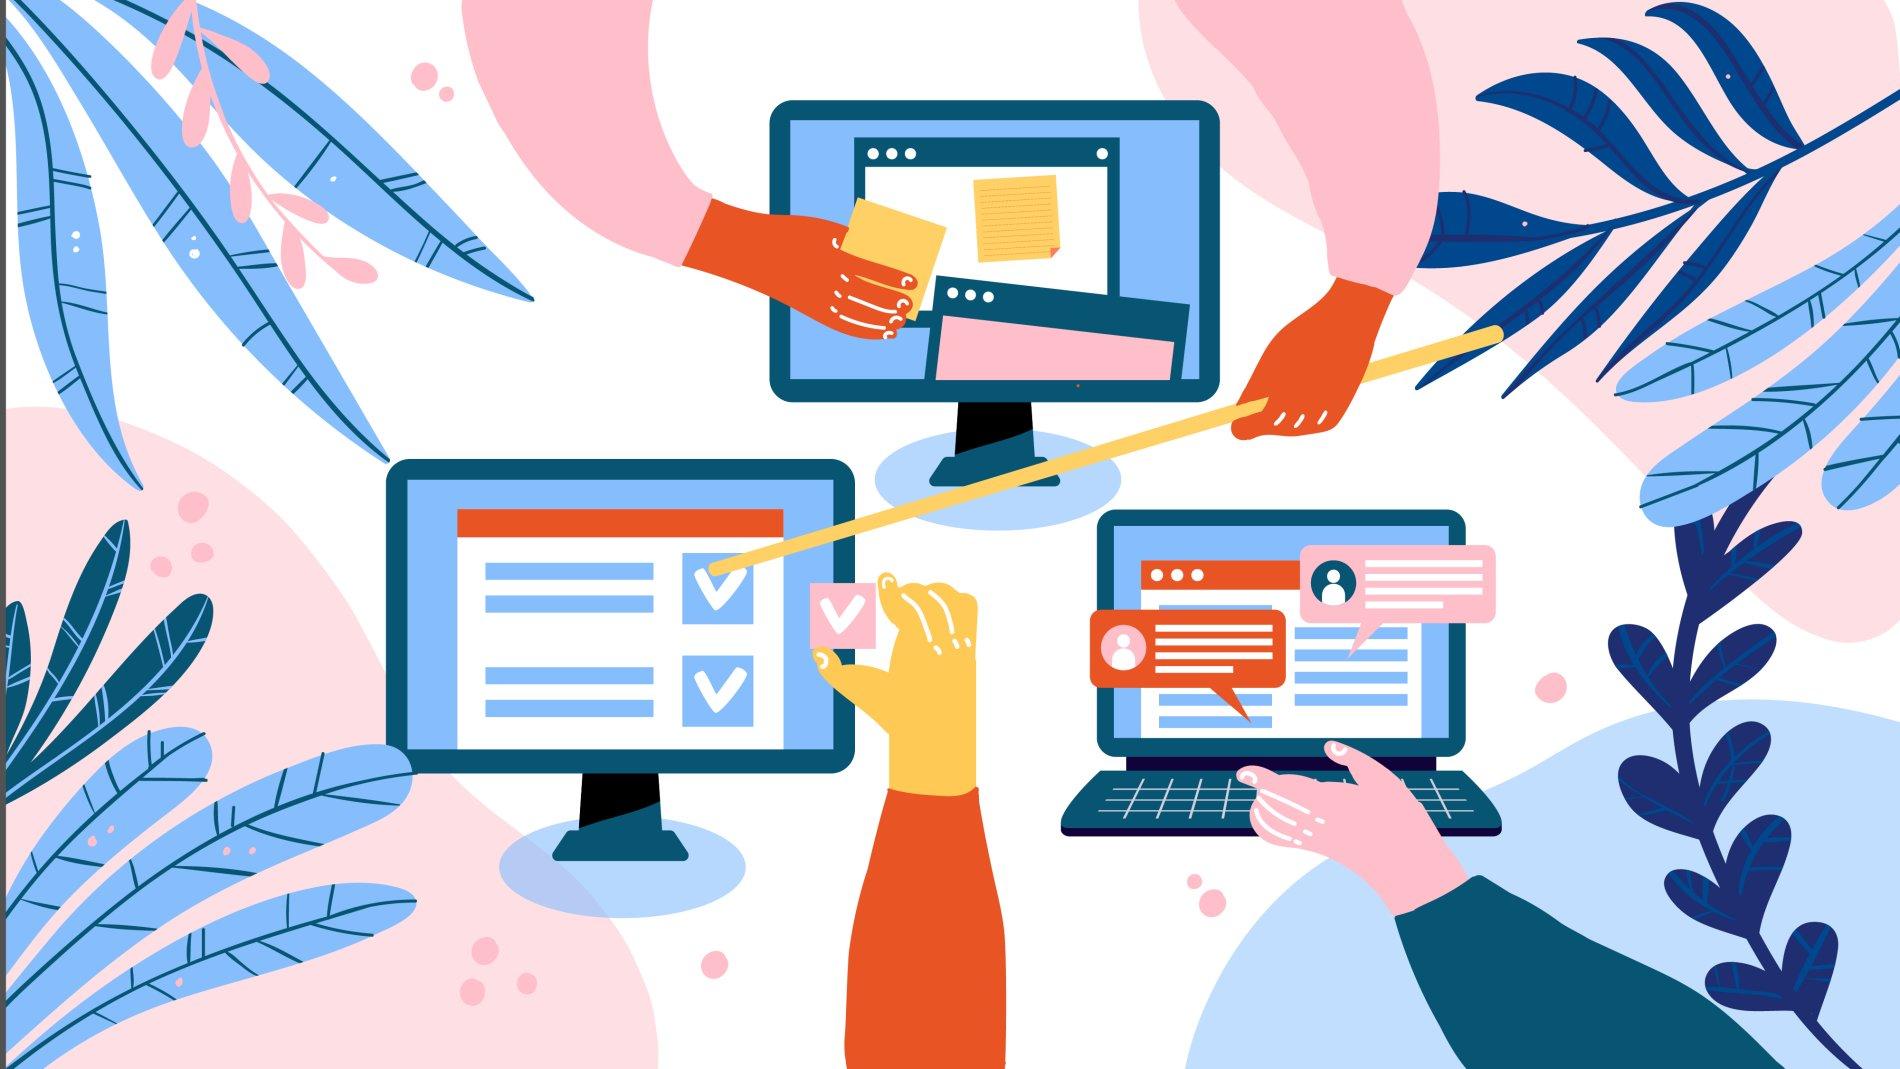 Illustration of teaching people via a webinar screens